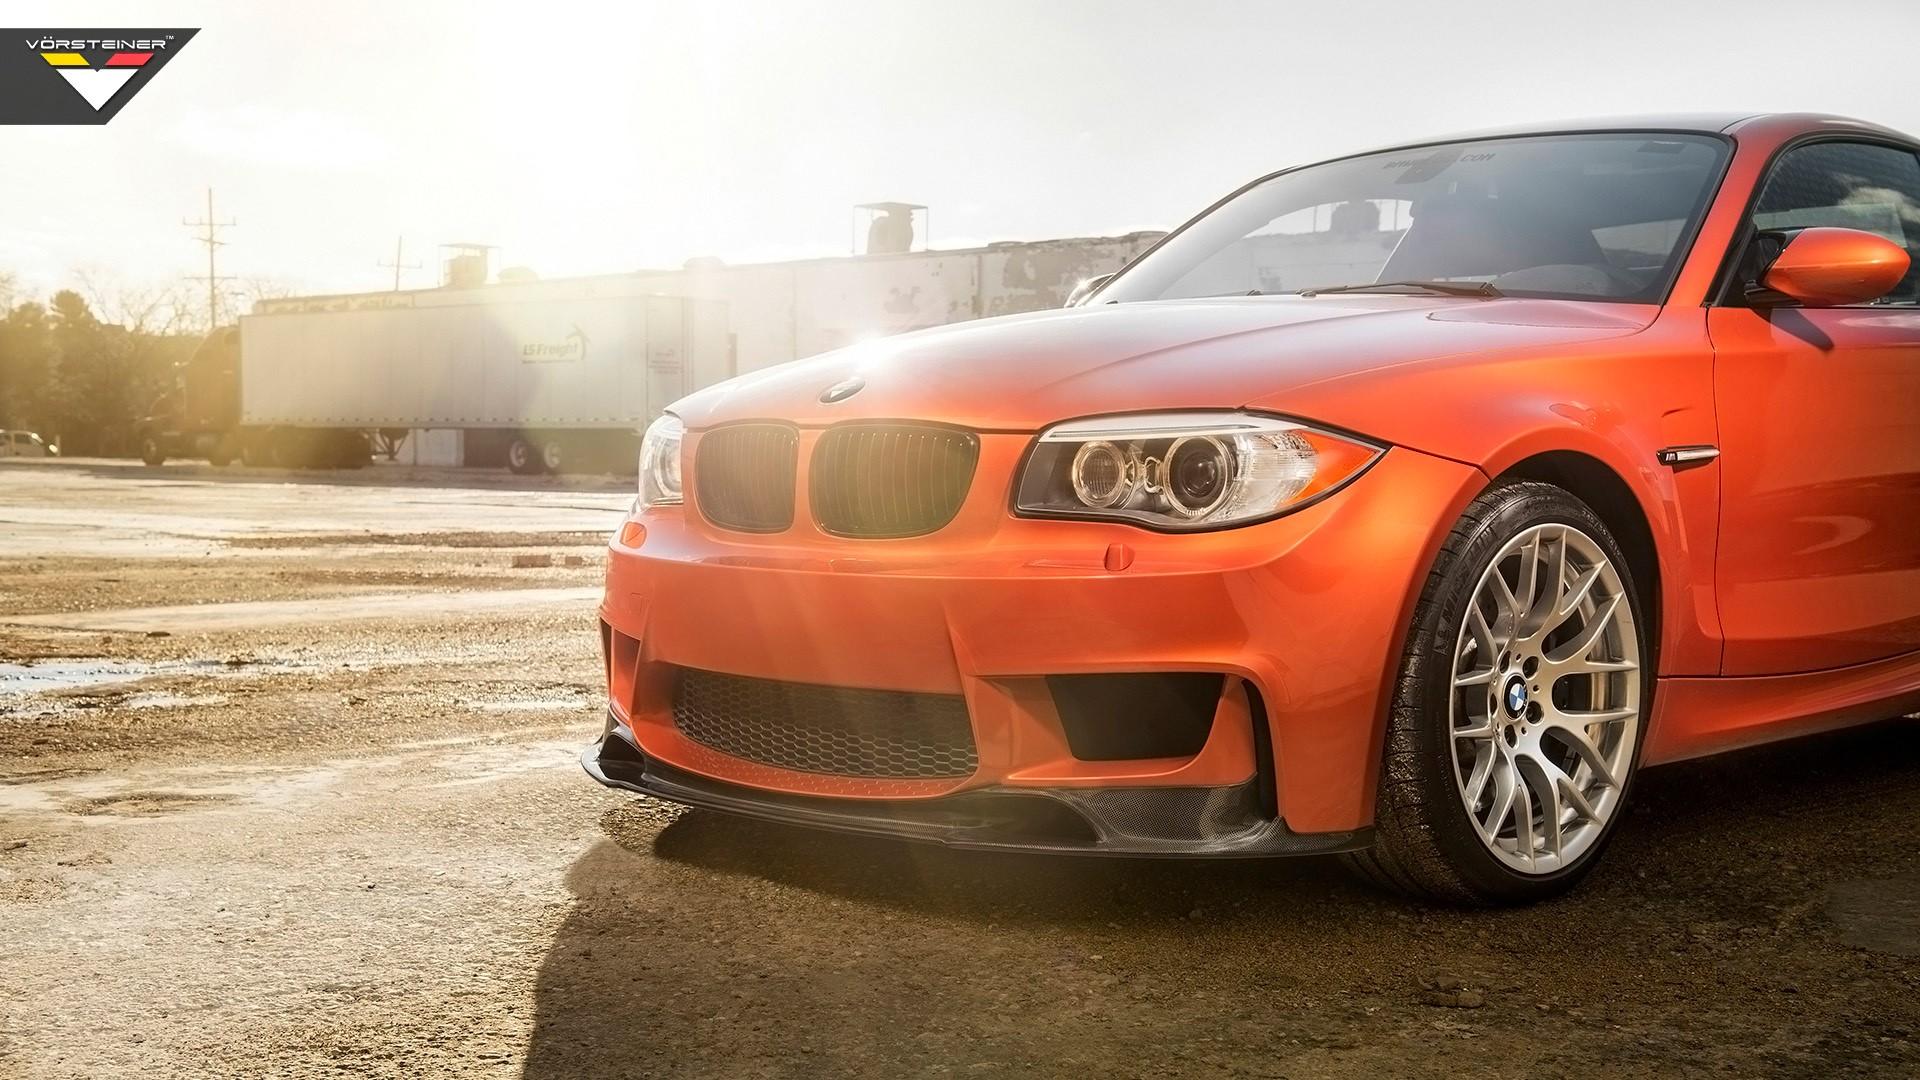 2014 Vorsteiner BMW E82 1M Coupe Wallpaper | HD Car ...